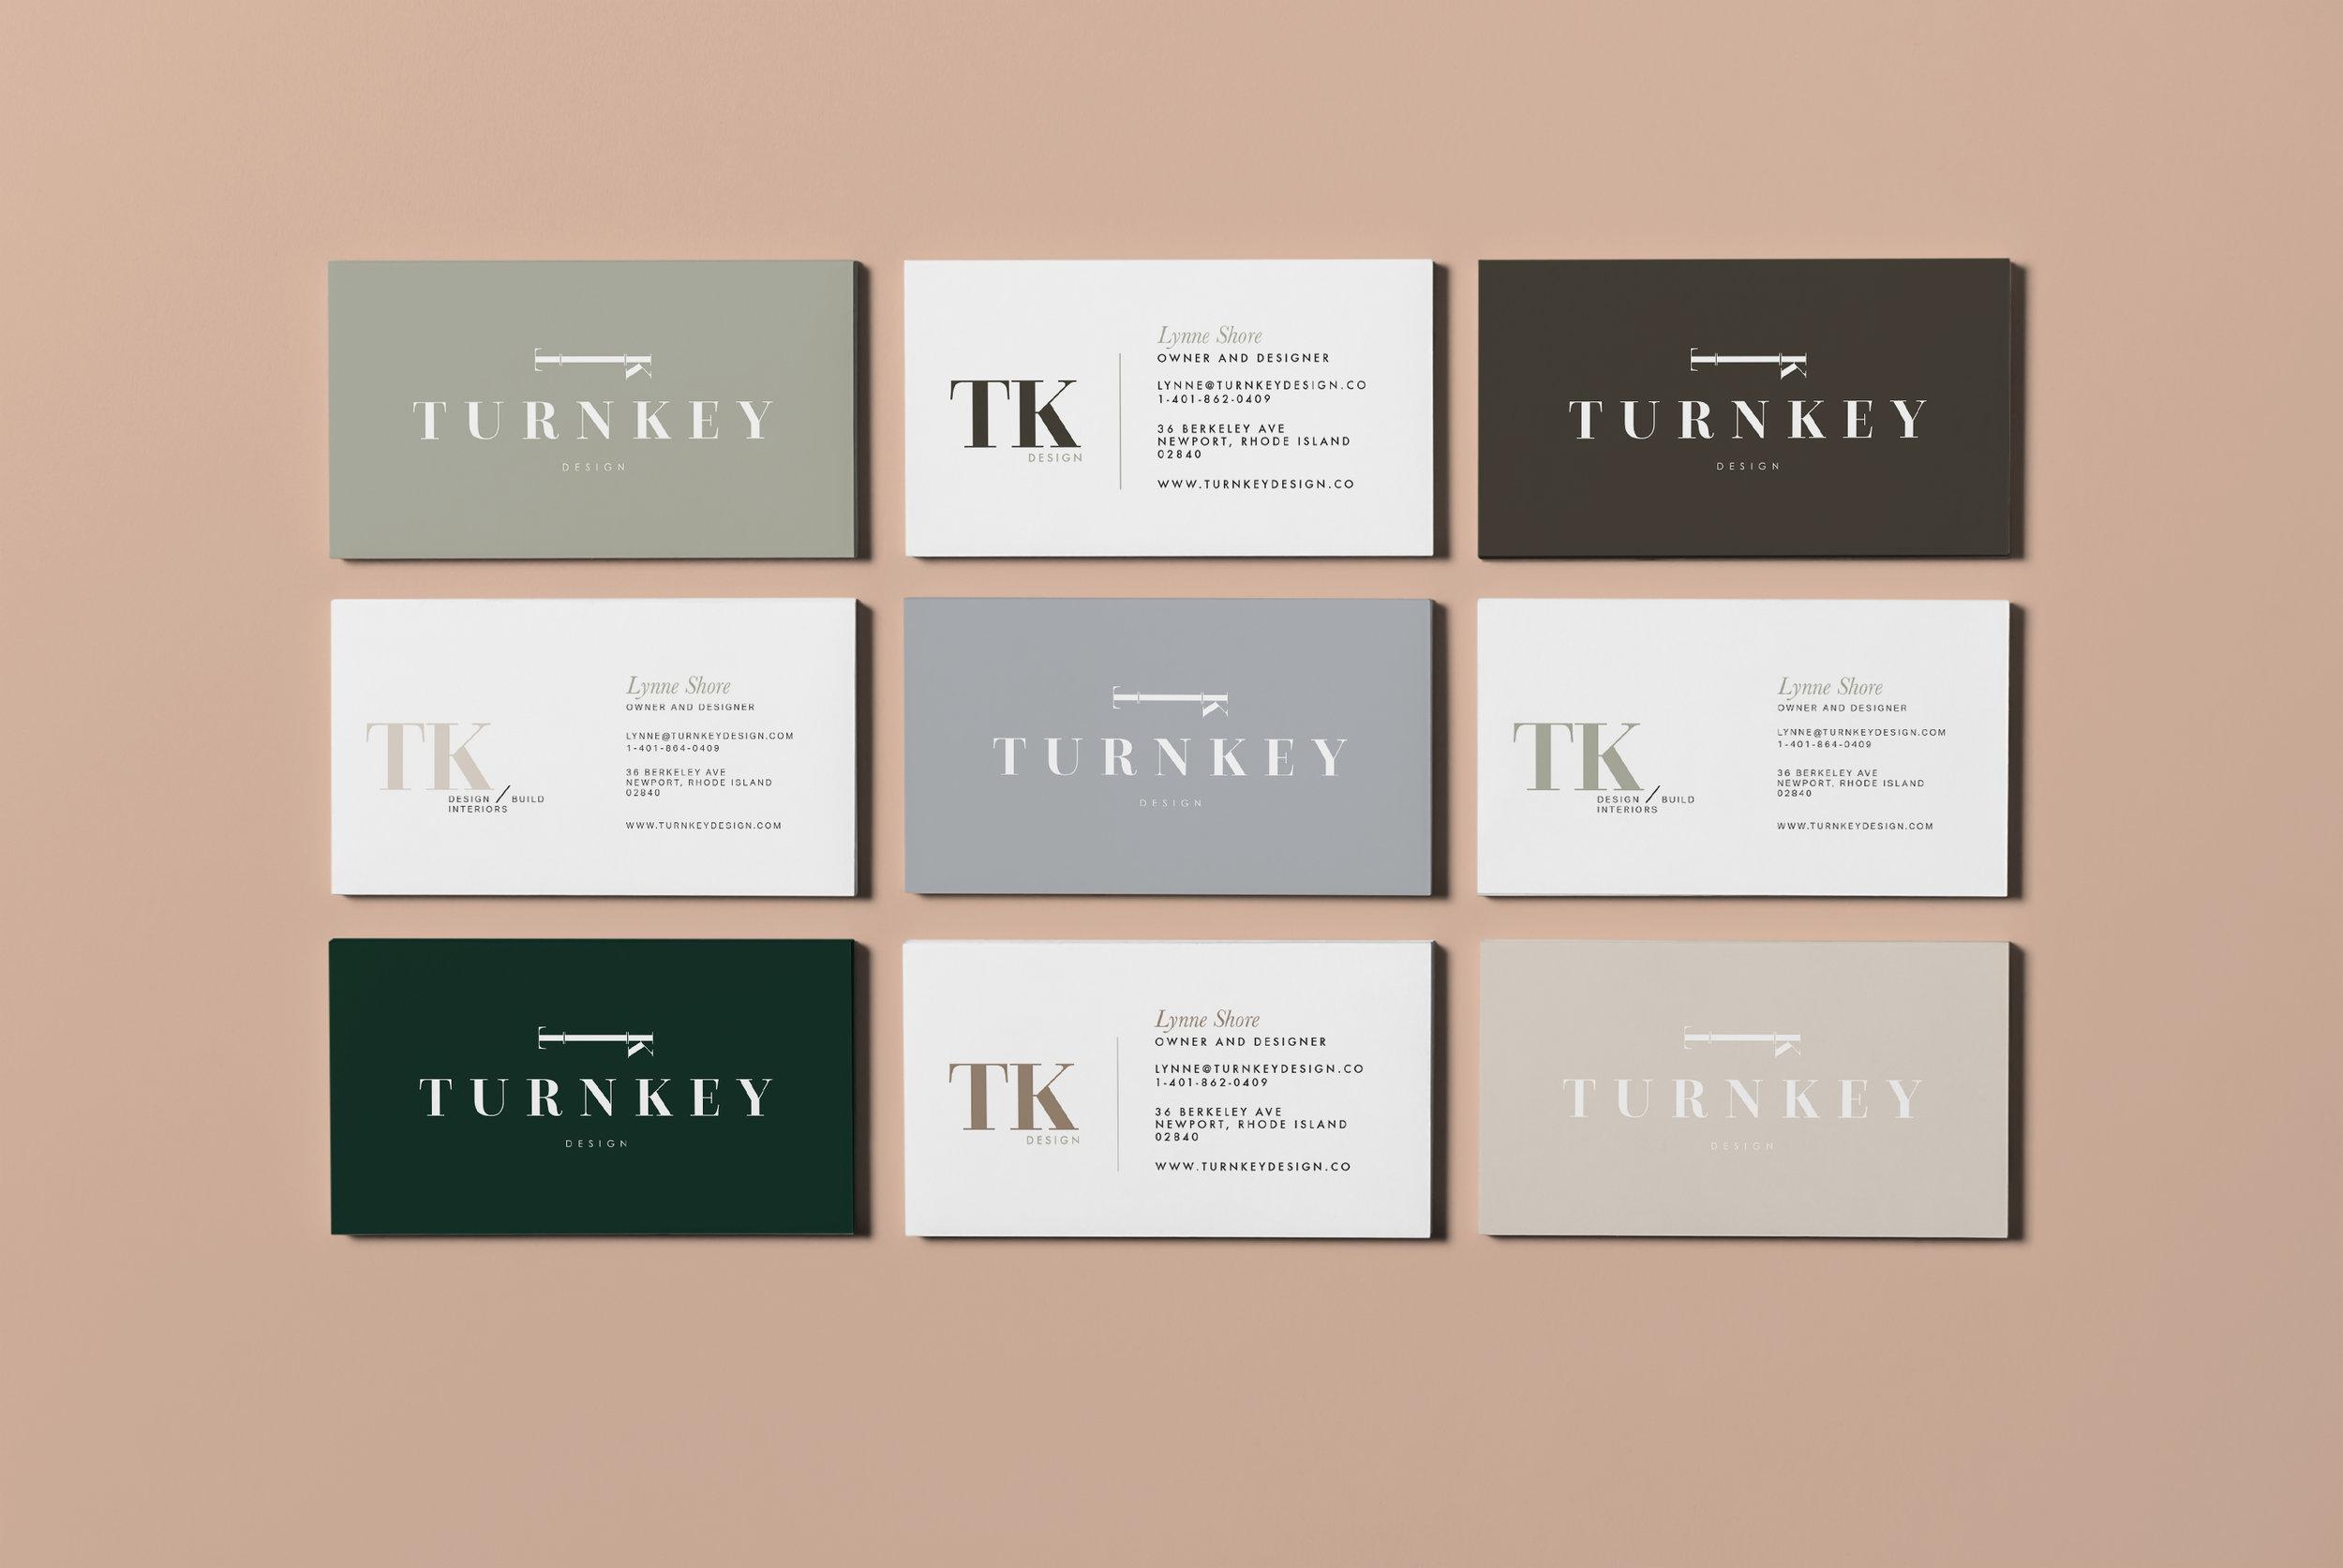 turnkey_business cards.jpg